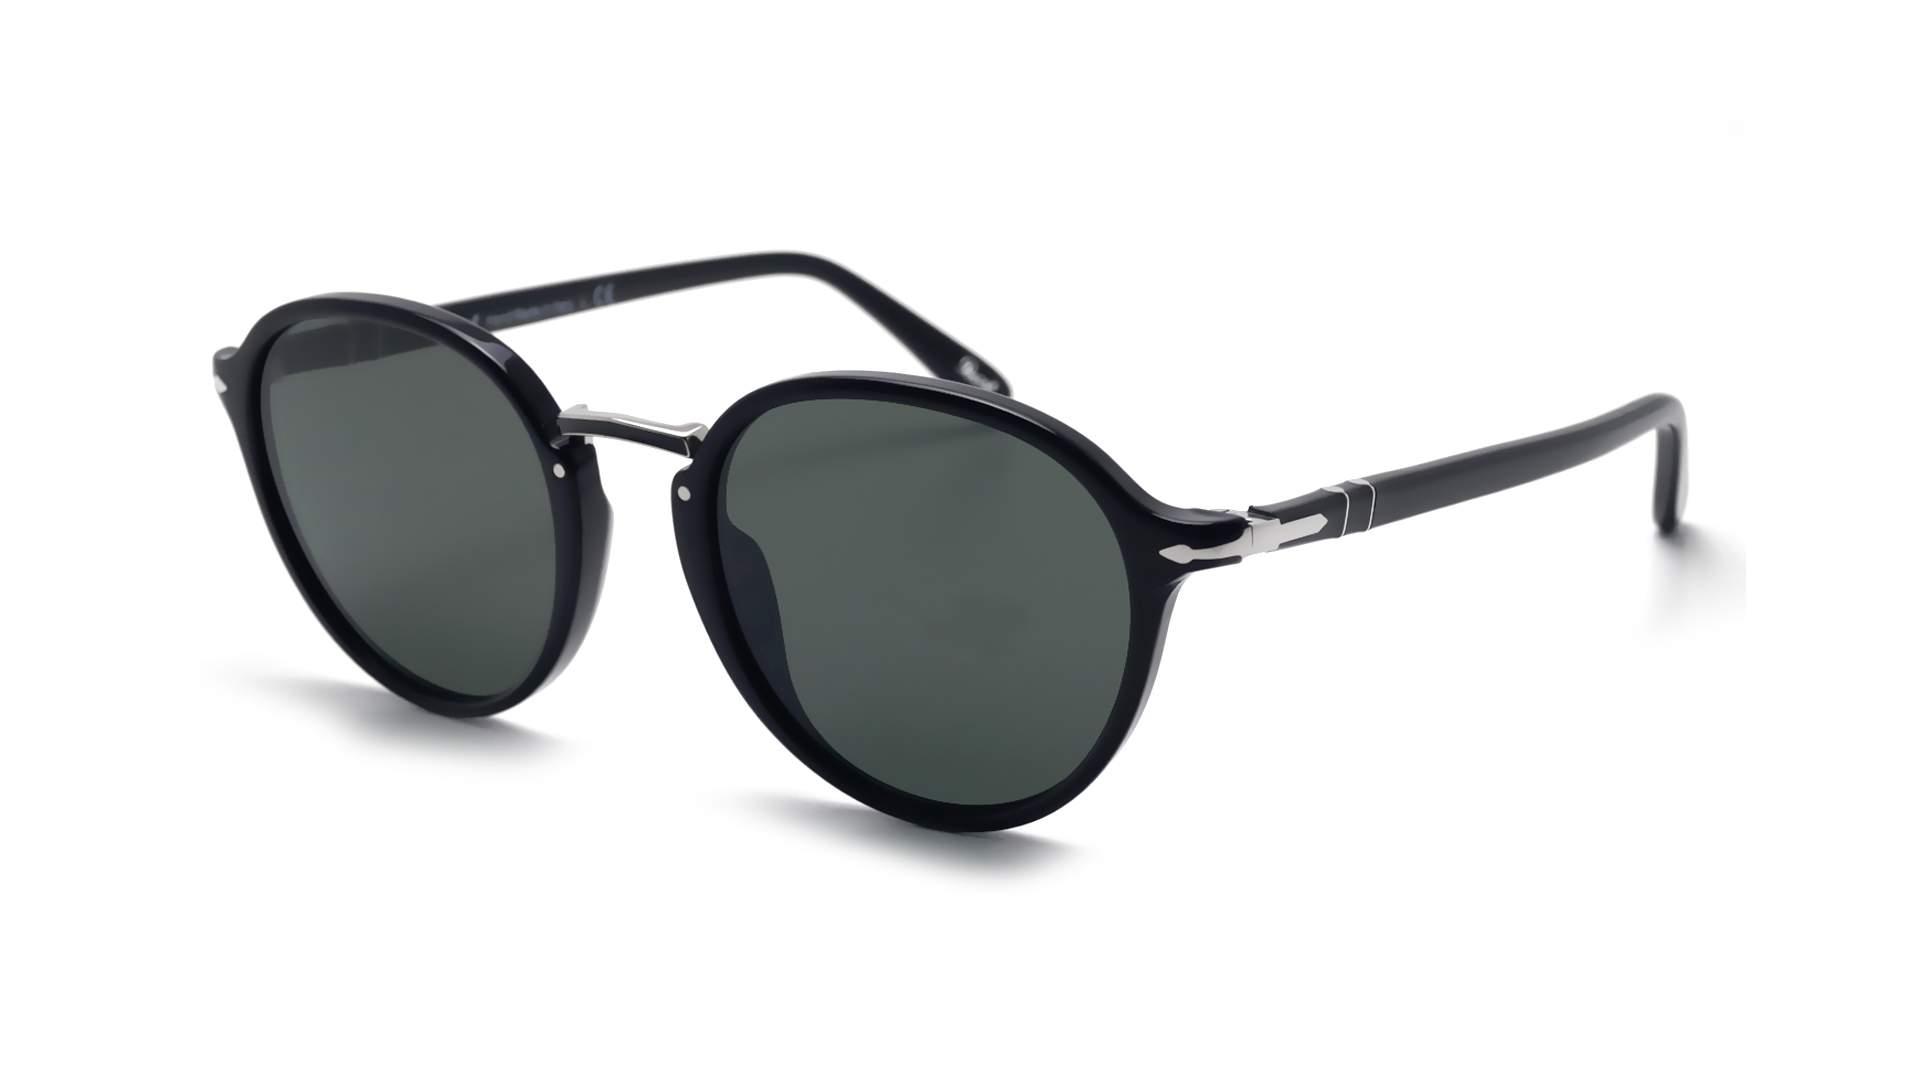 b817b21cb5 Sunglasses Persol Calligrapher edition Black PO3184S 95 31 51-21 Medium